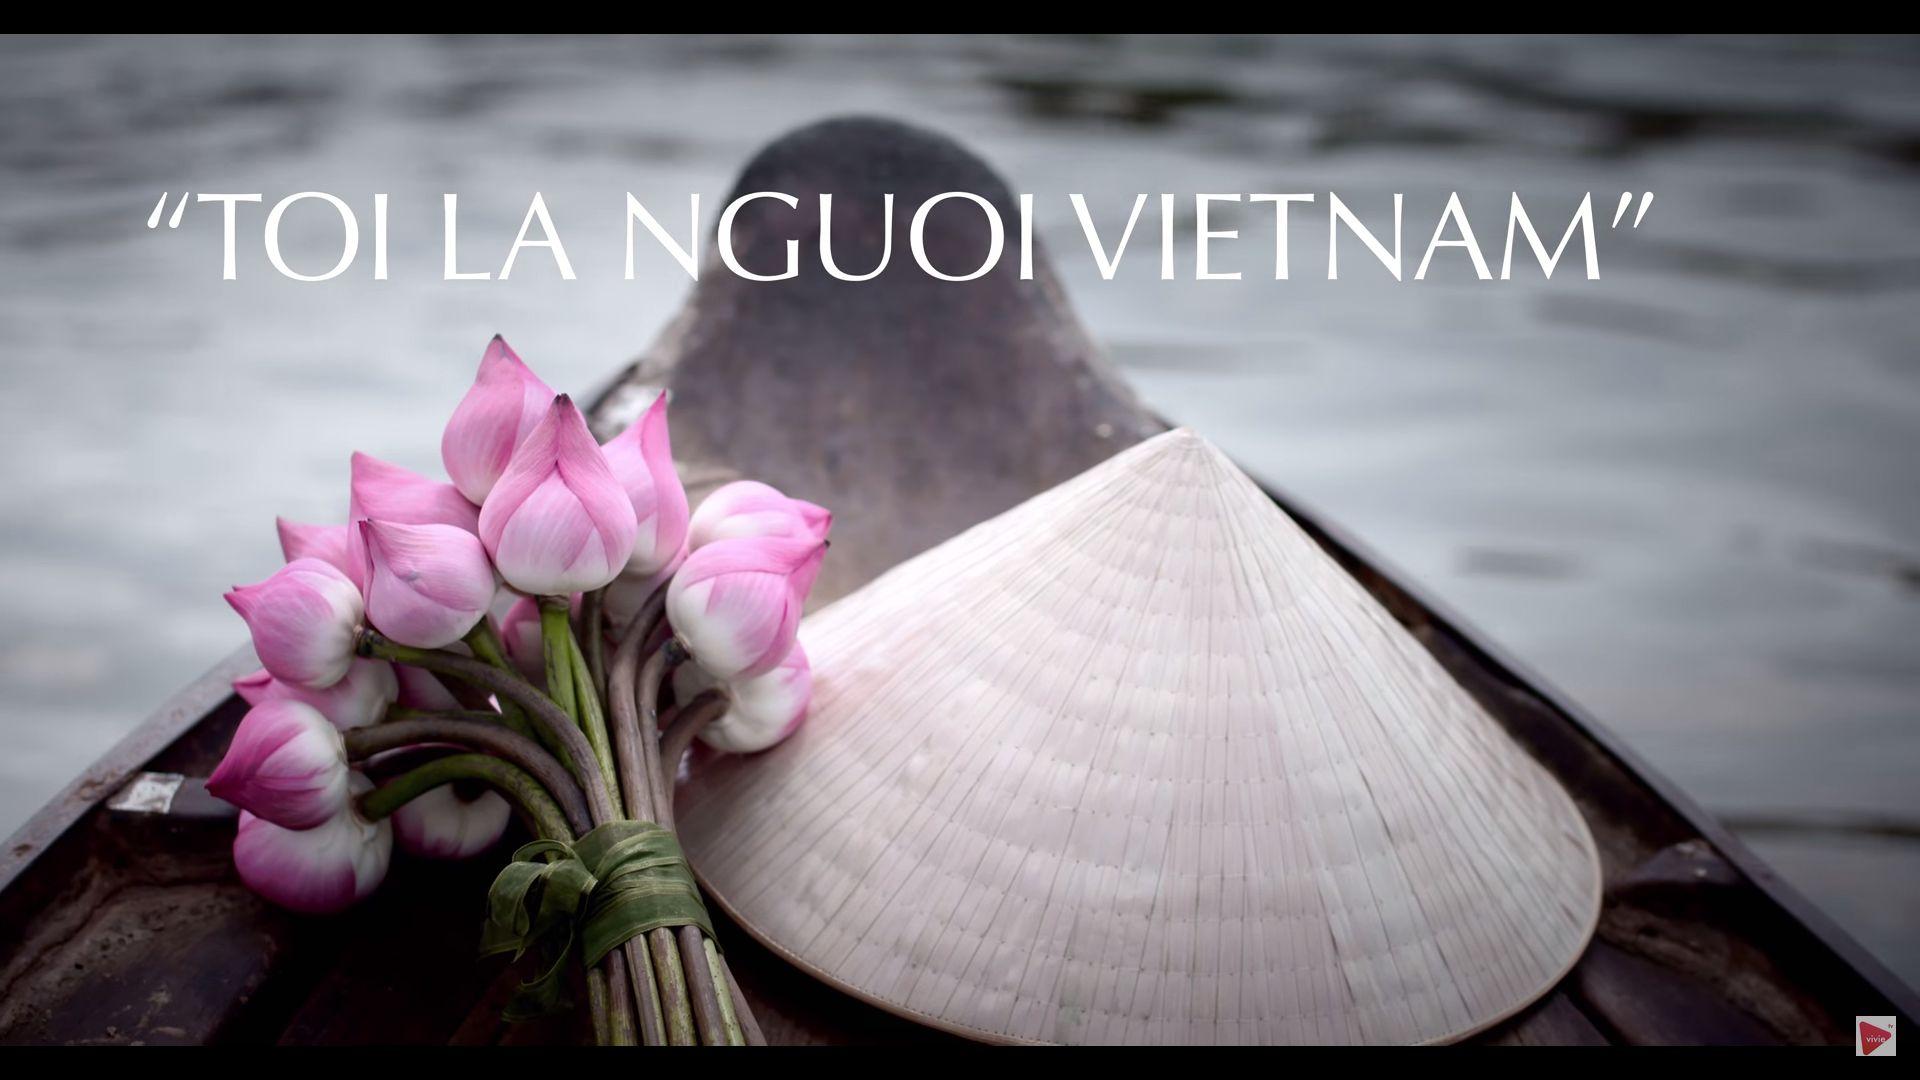 I am Vietnamese.